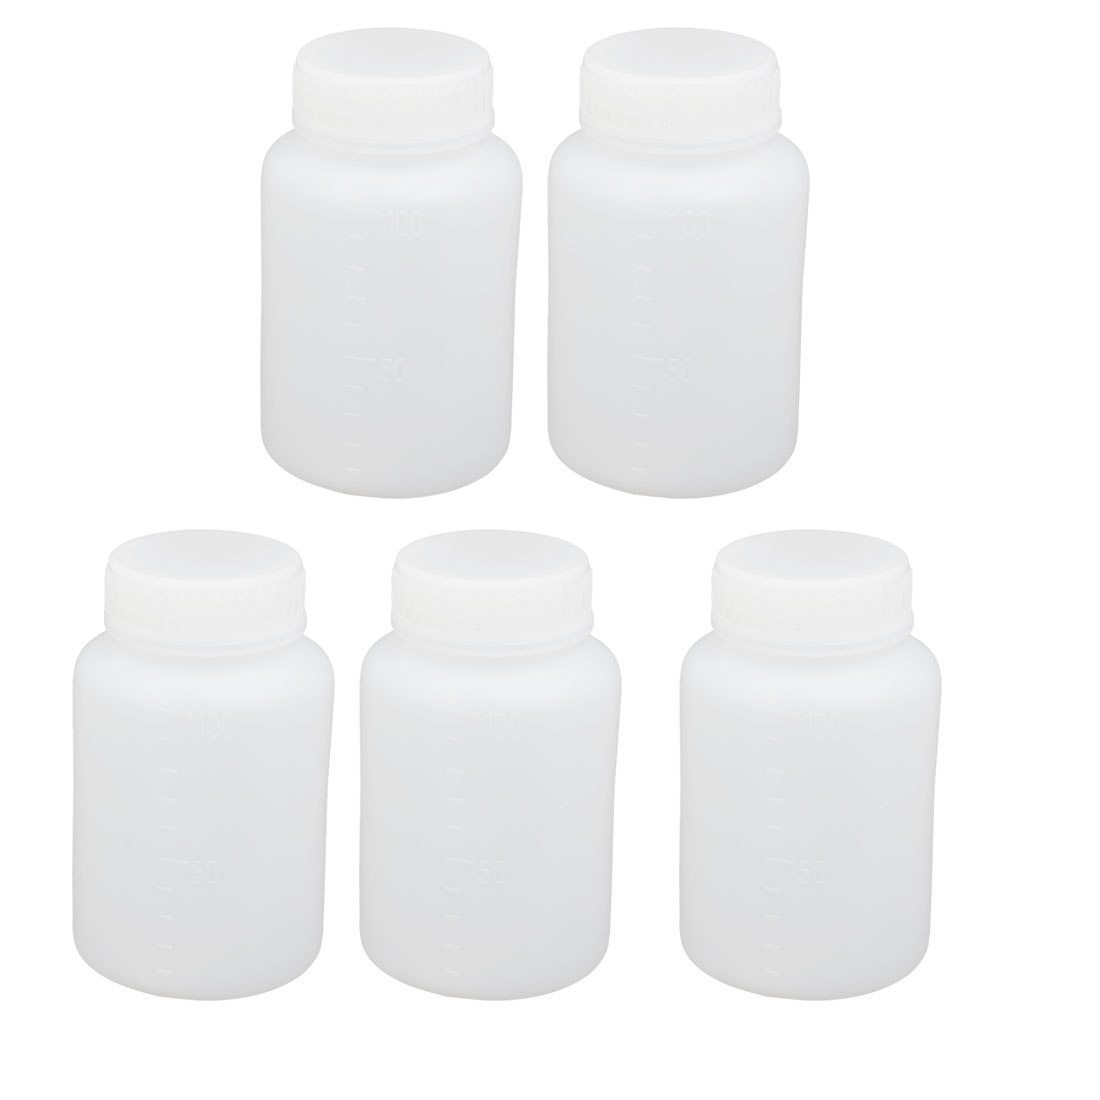 100ml PE Plastic Round Shaped Graduated Laboratory Experiment Bottle White 5pcs